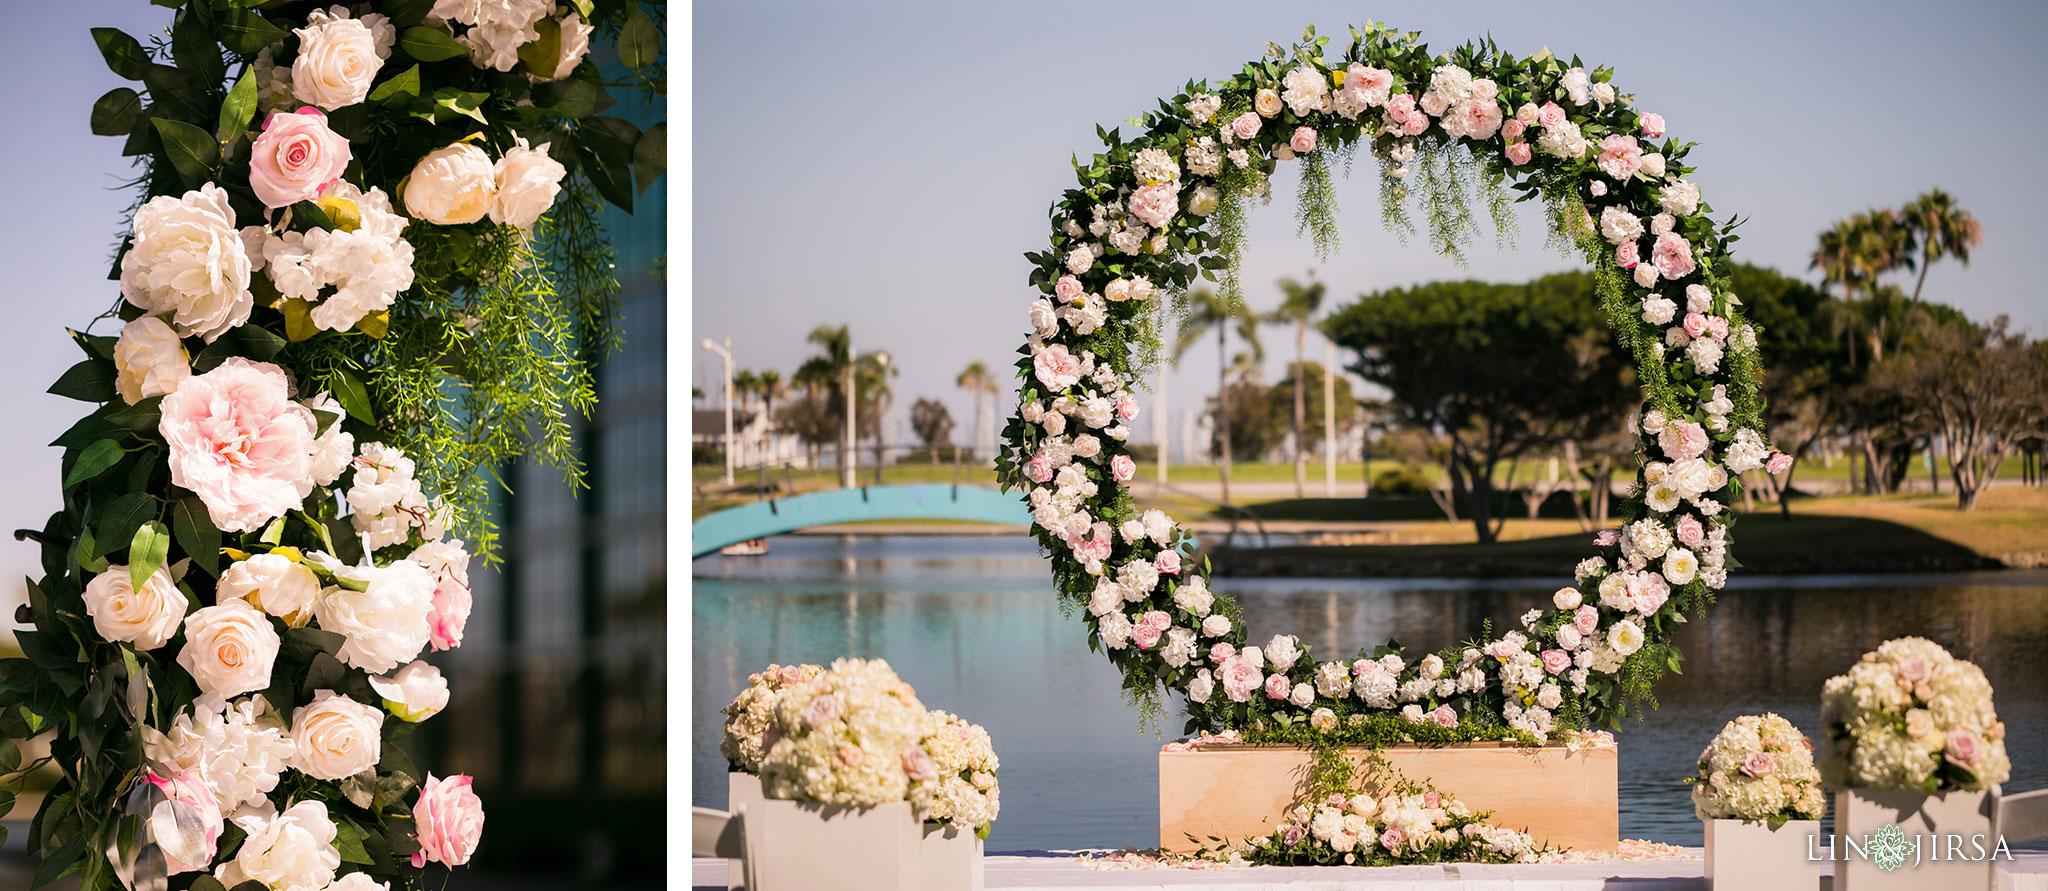 13 hyatt regency long beach wedding photography